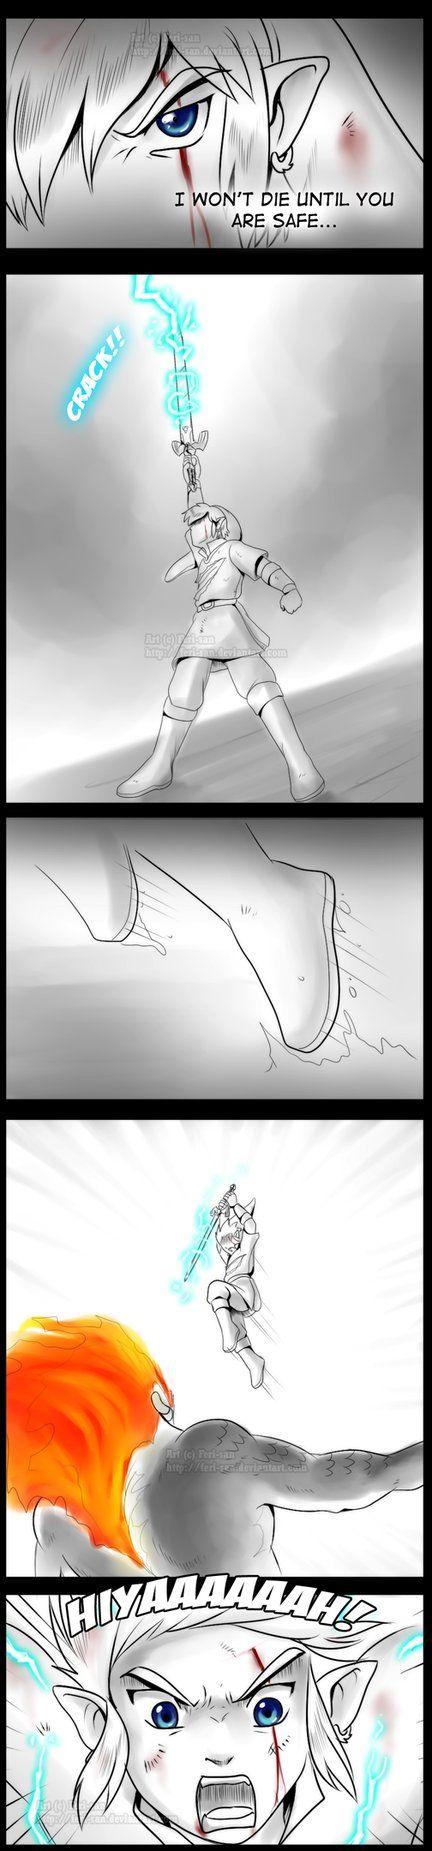 Finally Over P.4 by *Feri-san :O